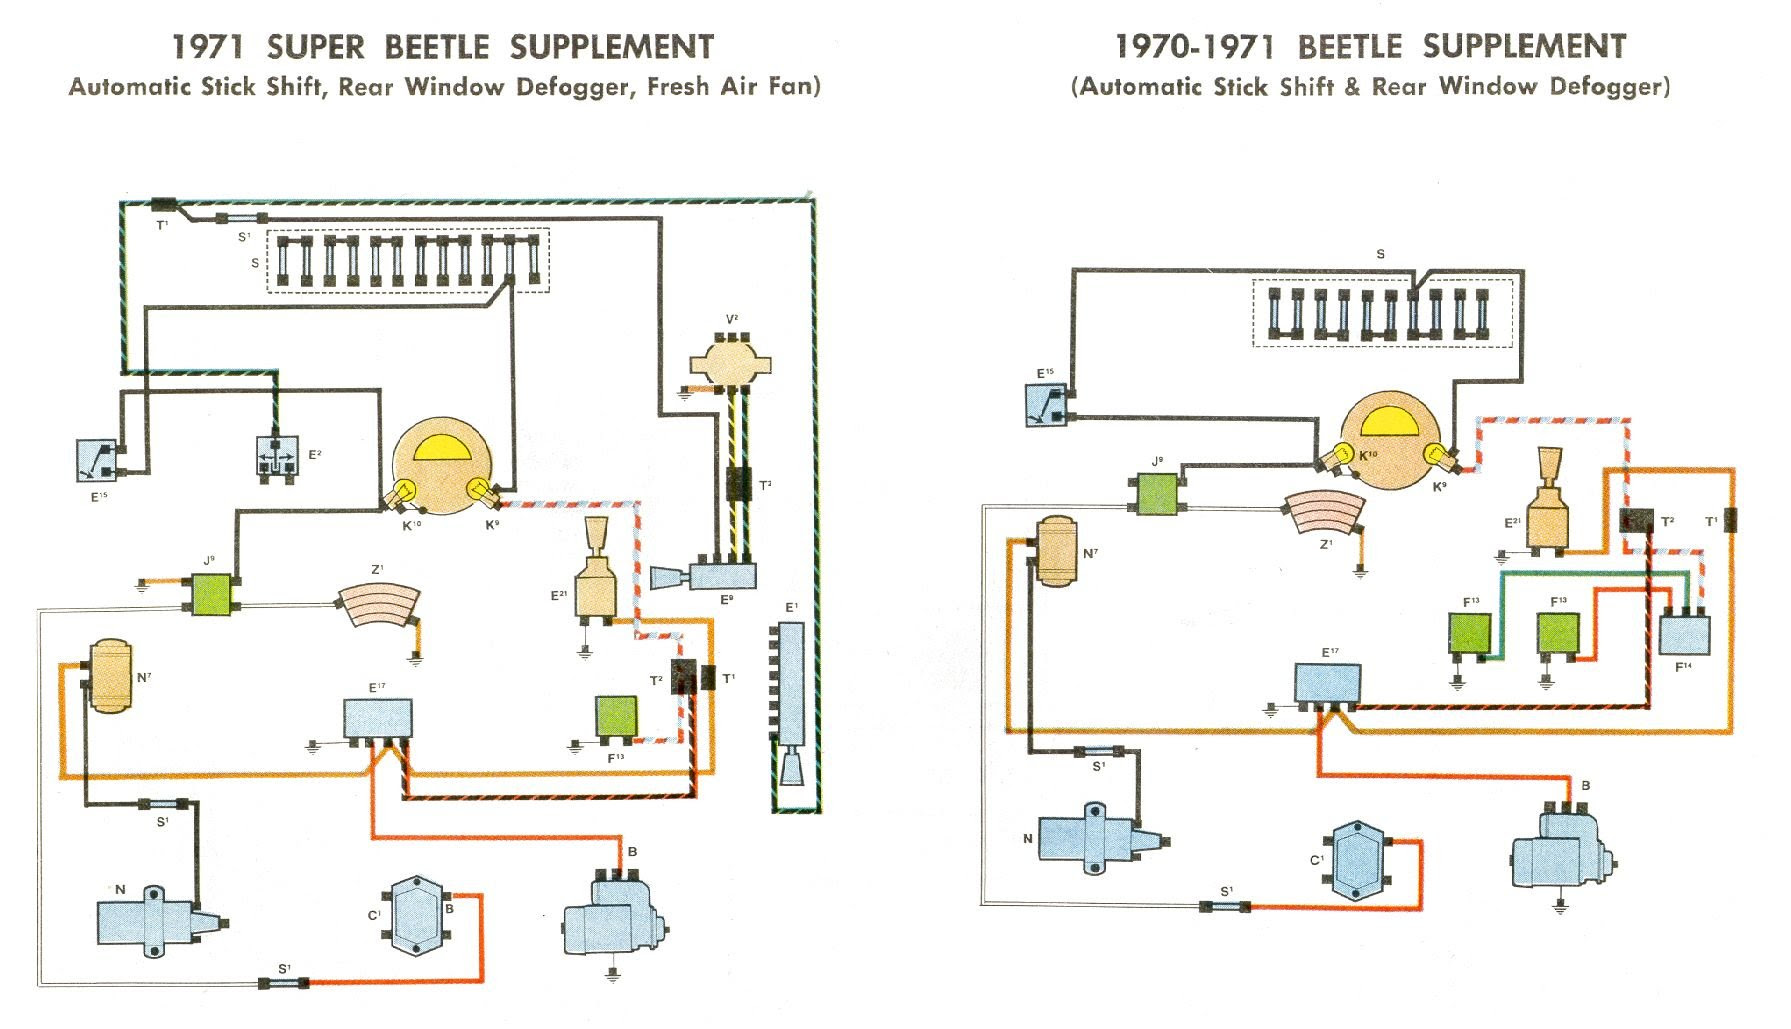 1970 Vw Speedometer Wiring Diagram Wiring Diagrams Chatter Chatter Chatteriedelavalleedufelin Fr